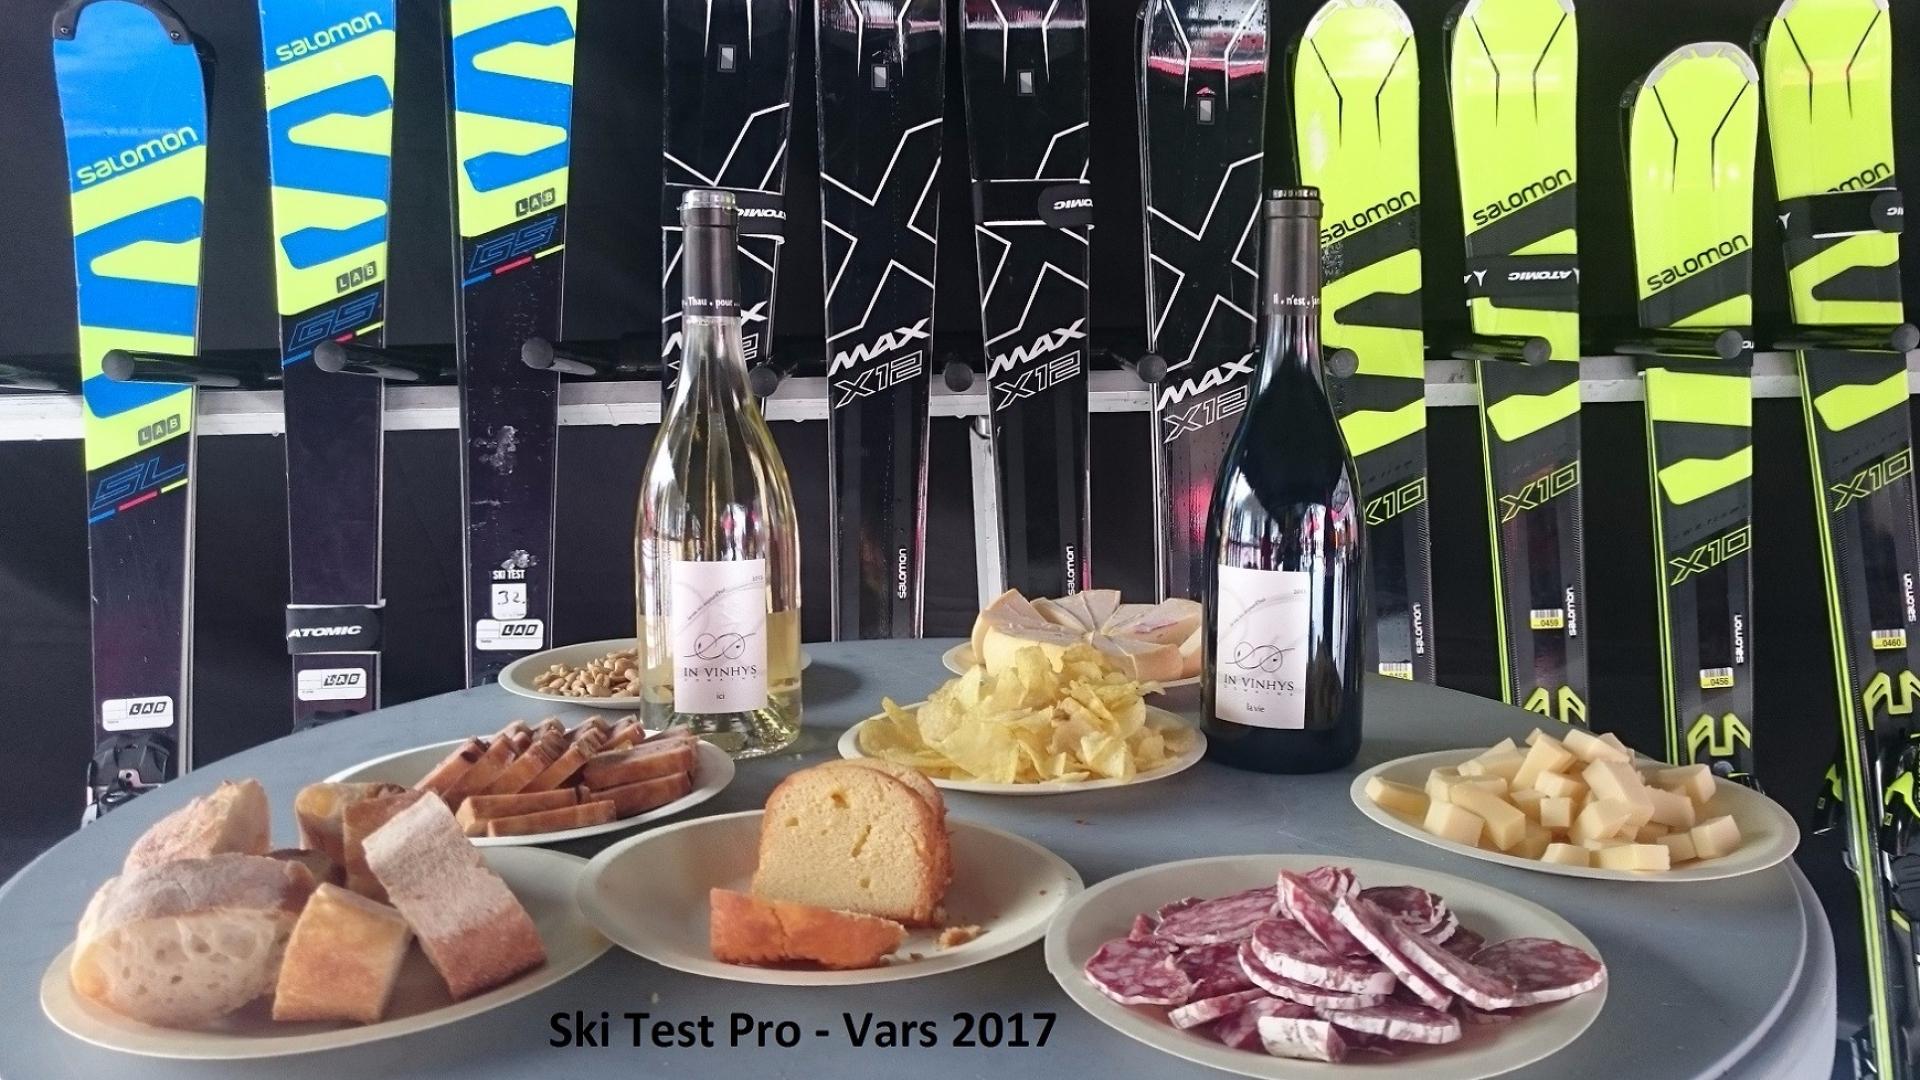 Ski Test Pro – Vars 2017